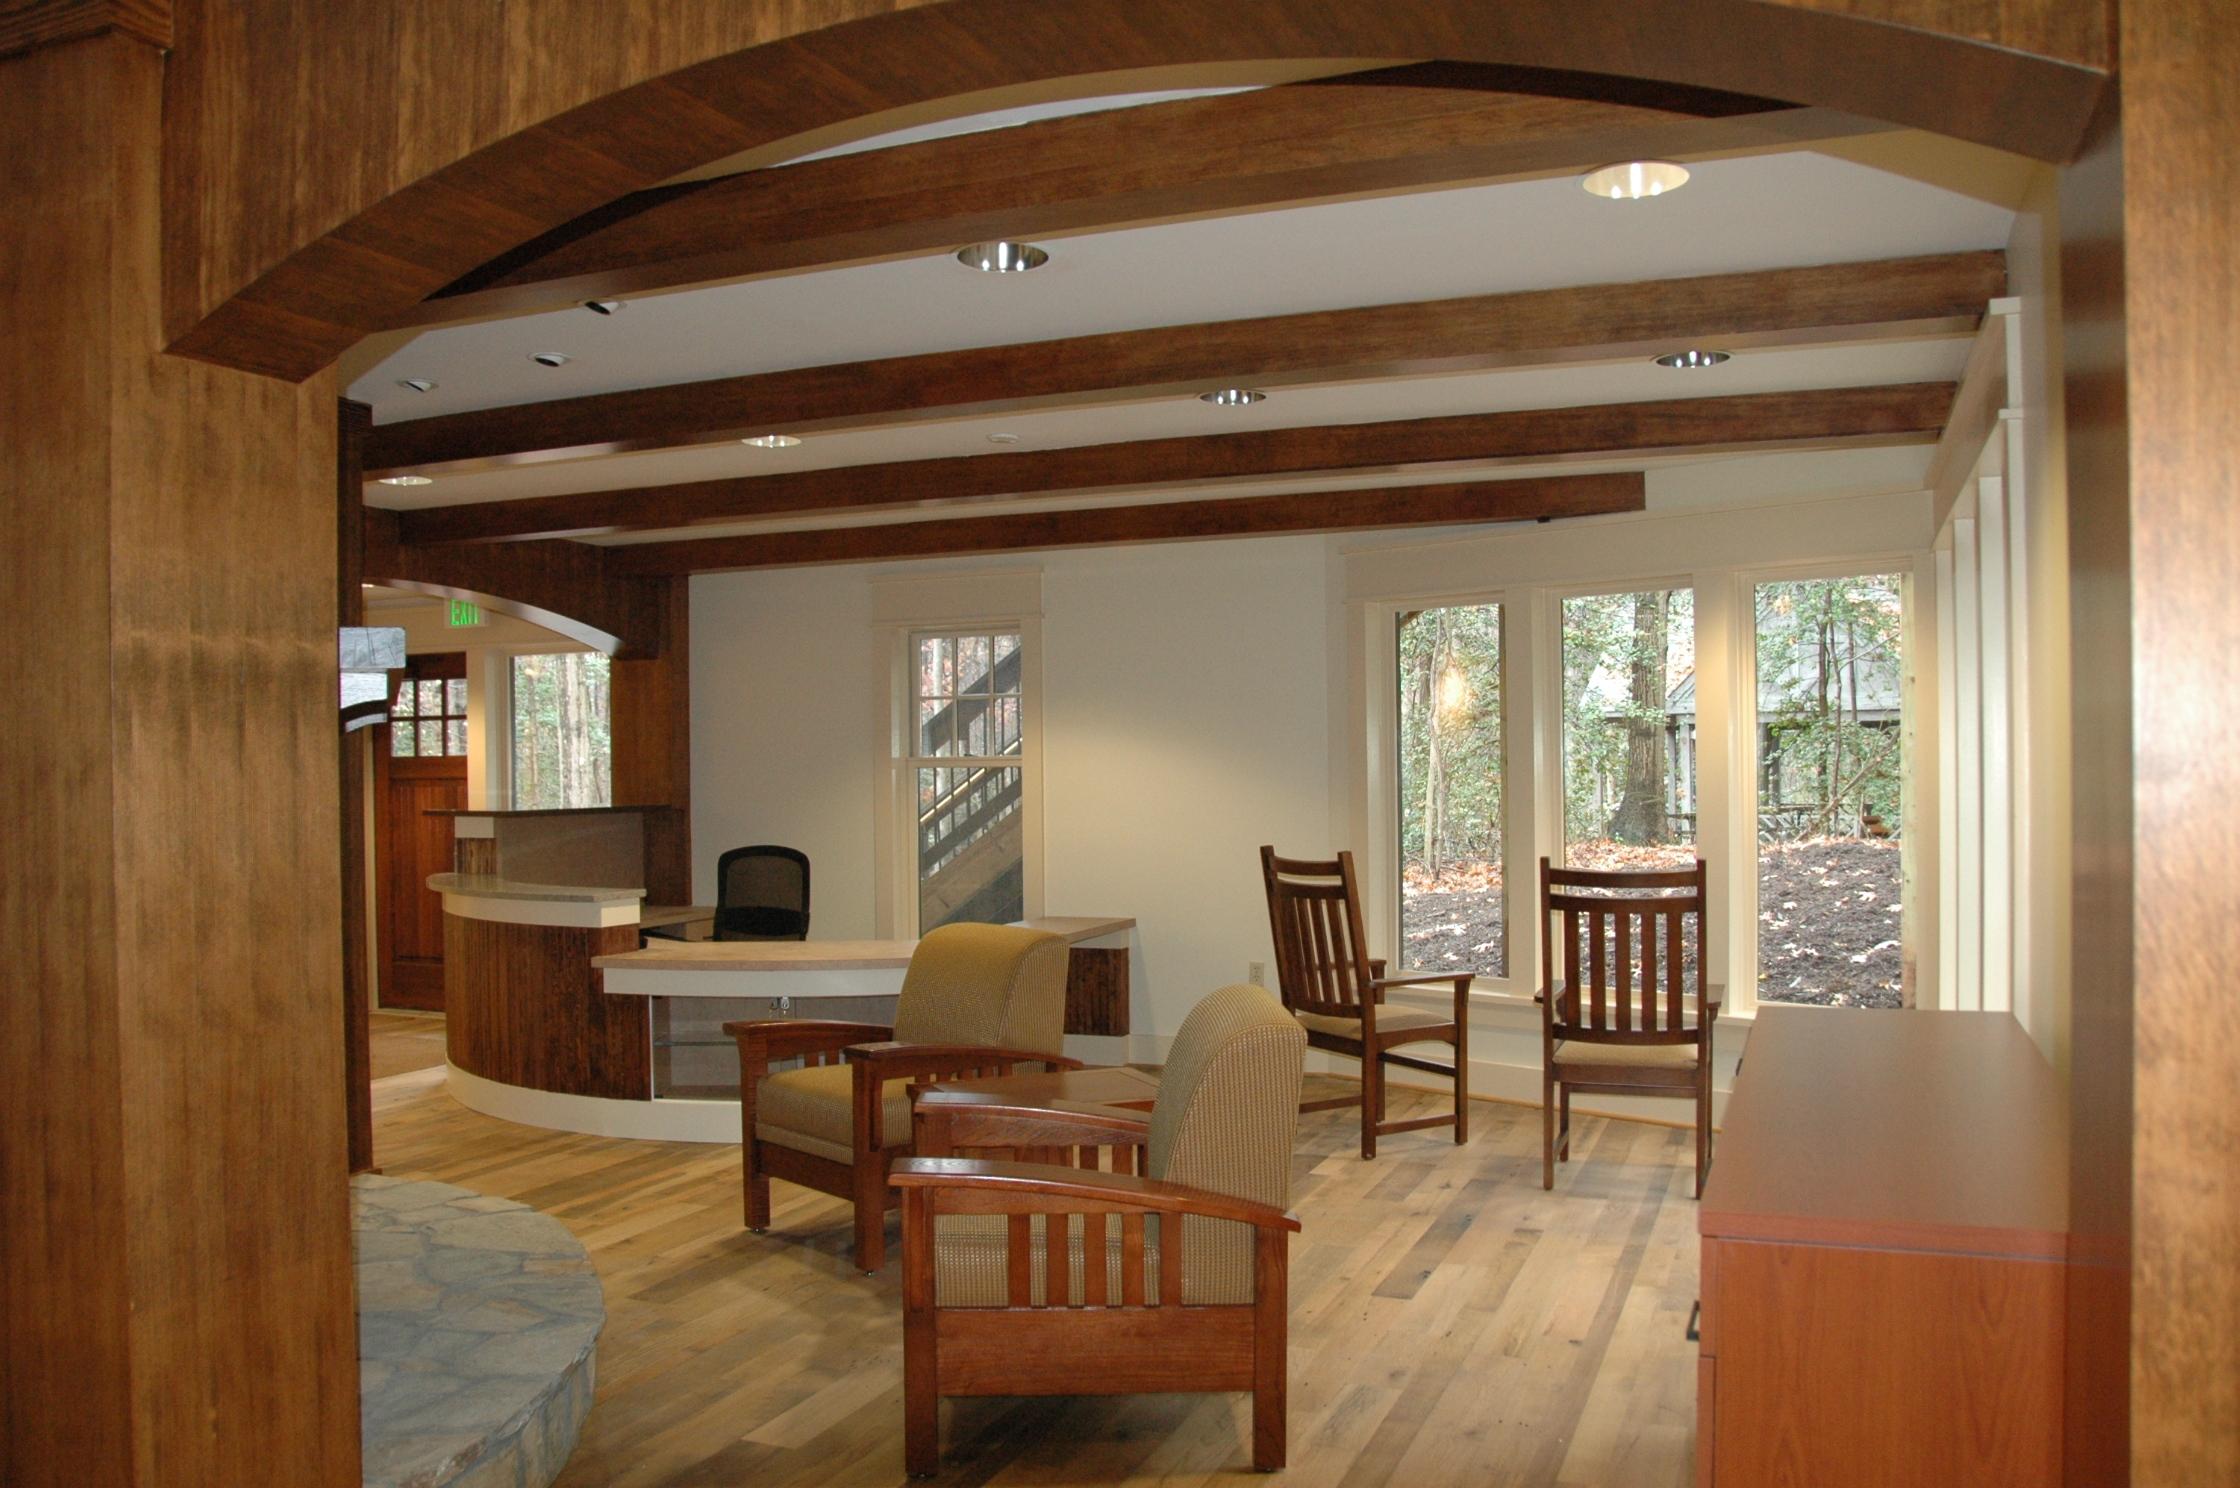 Vajira house in sri lanka interior decoration ideas by for Interior designs in sri lanka